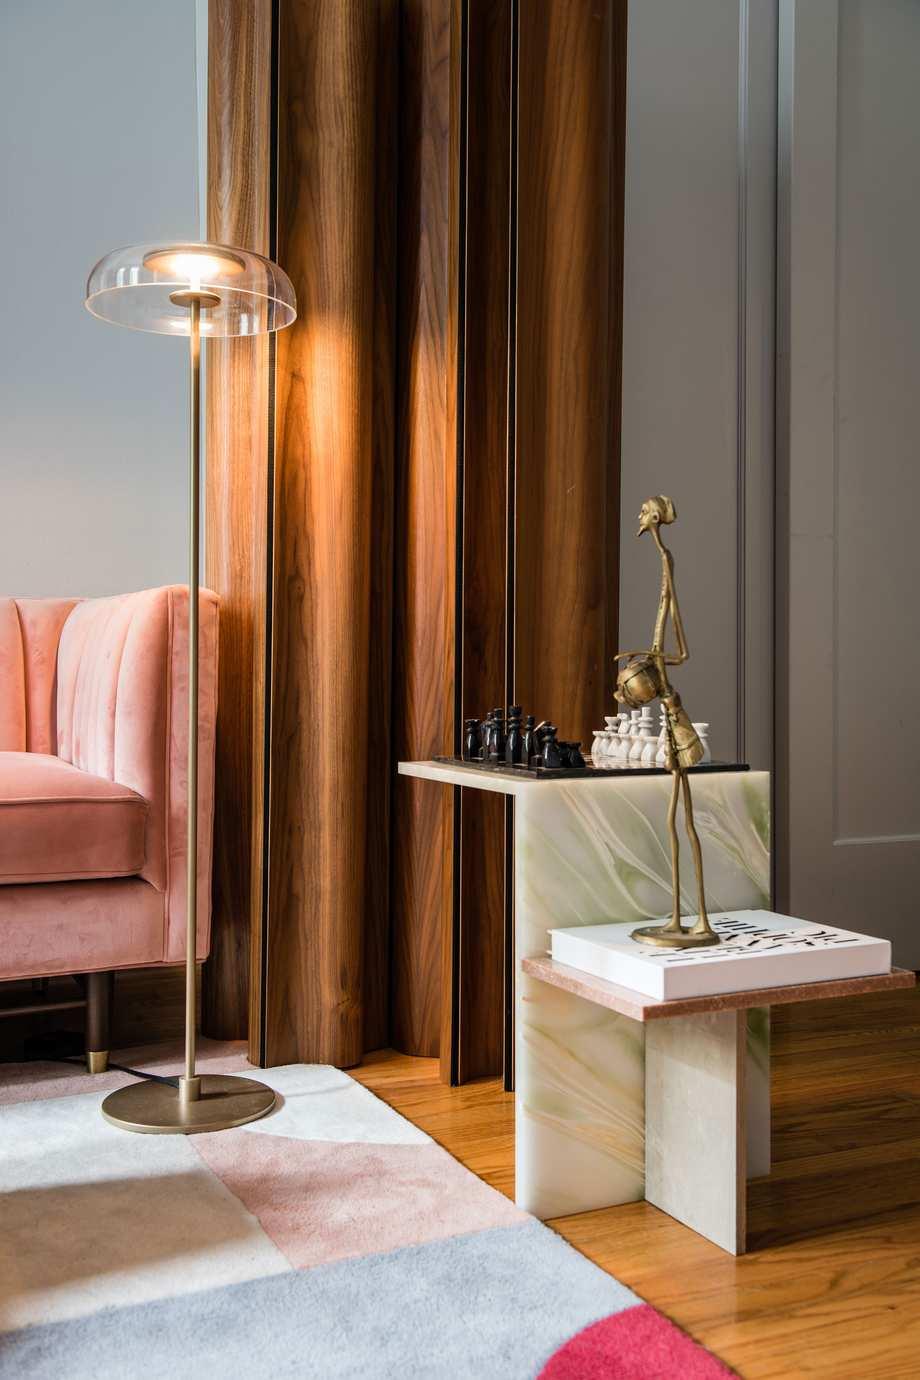 The Nordroom - A Designer's Stylish New York Studio Apartment